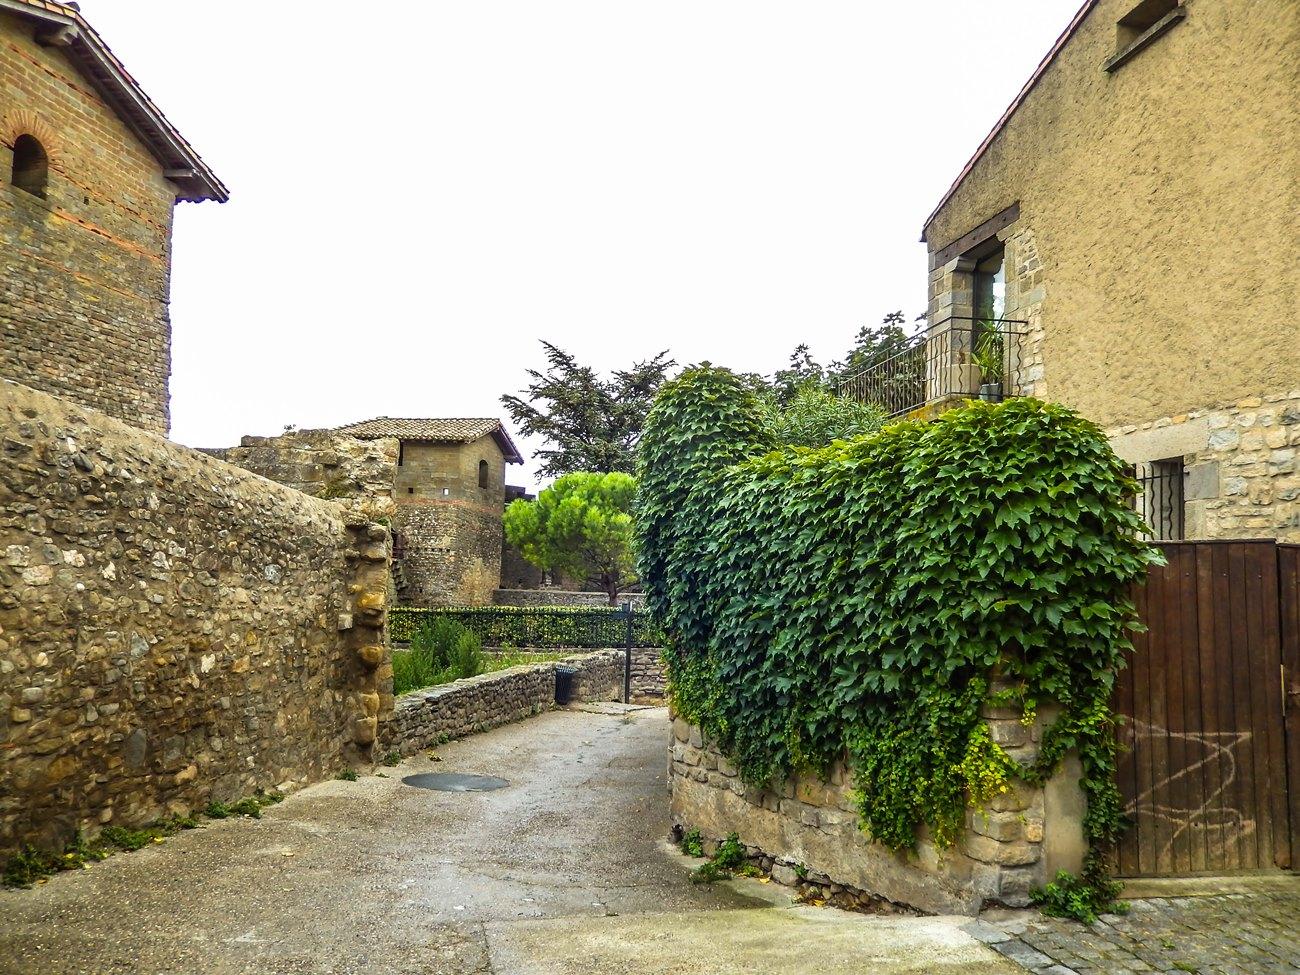 irina-fortuna-Carcassonne-france 12.jpg